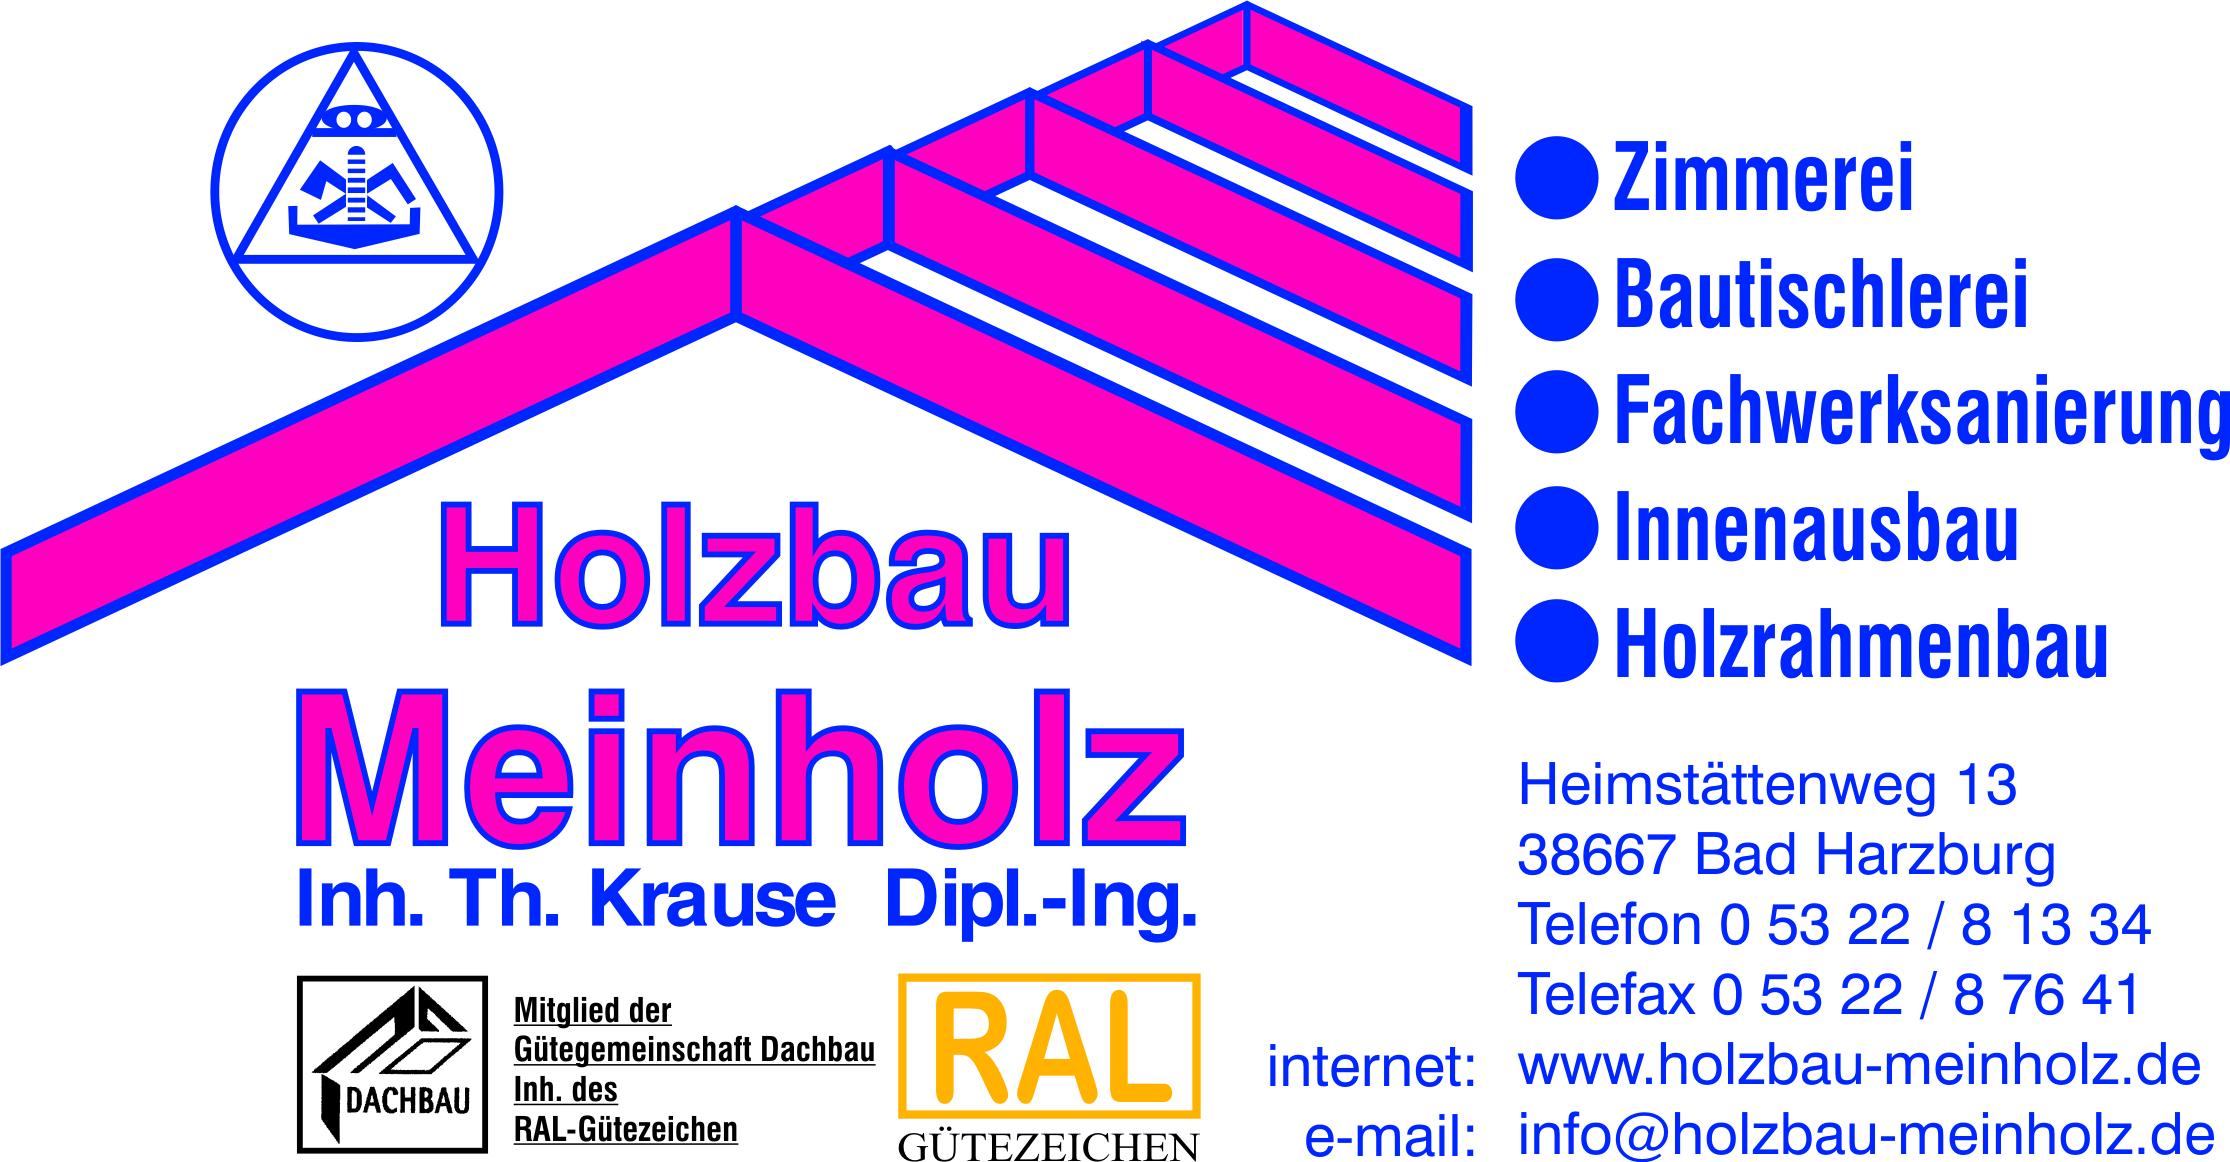 Holzbau Meinholz